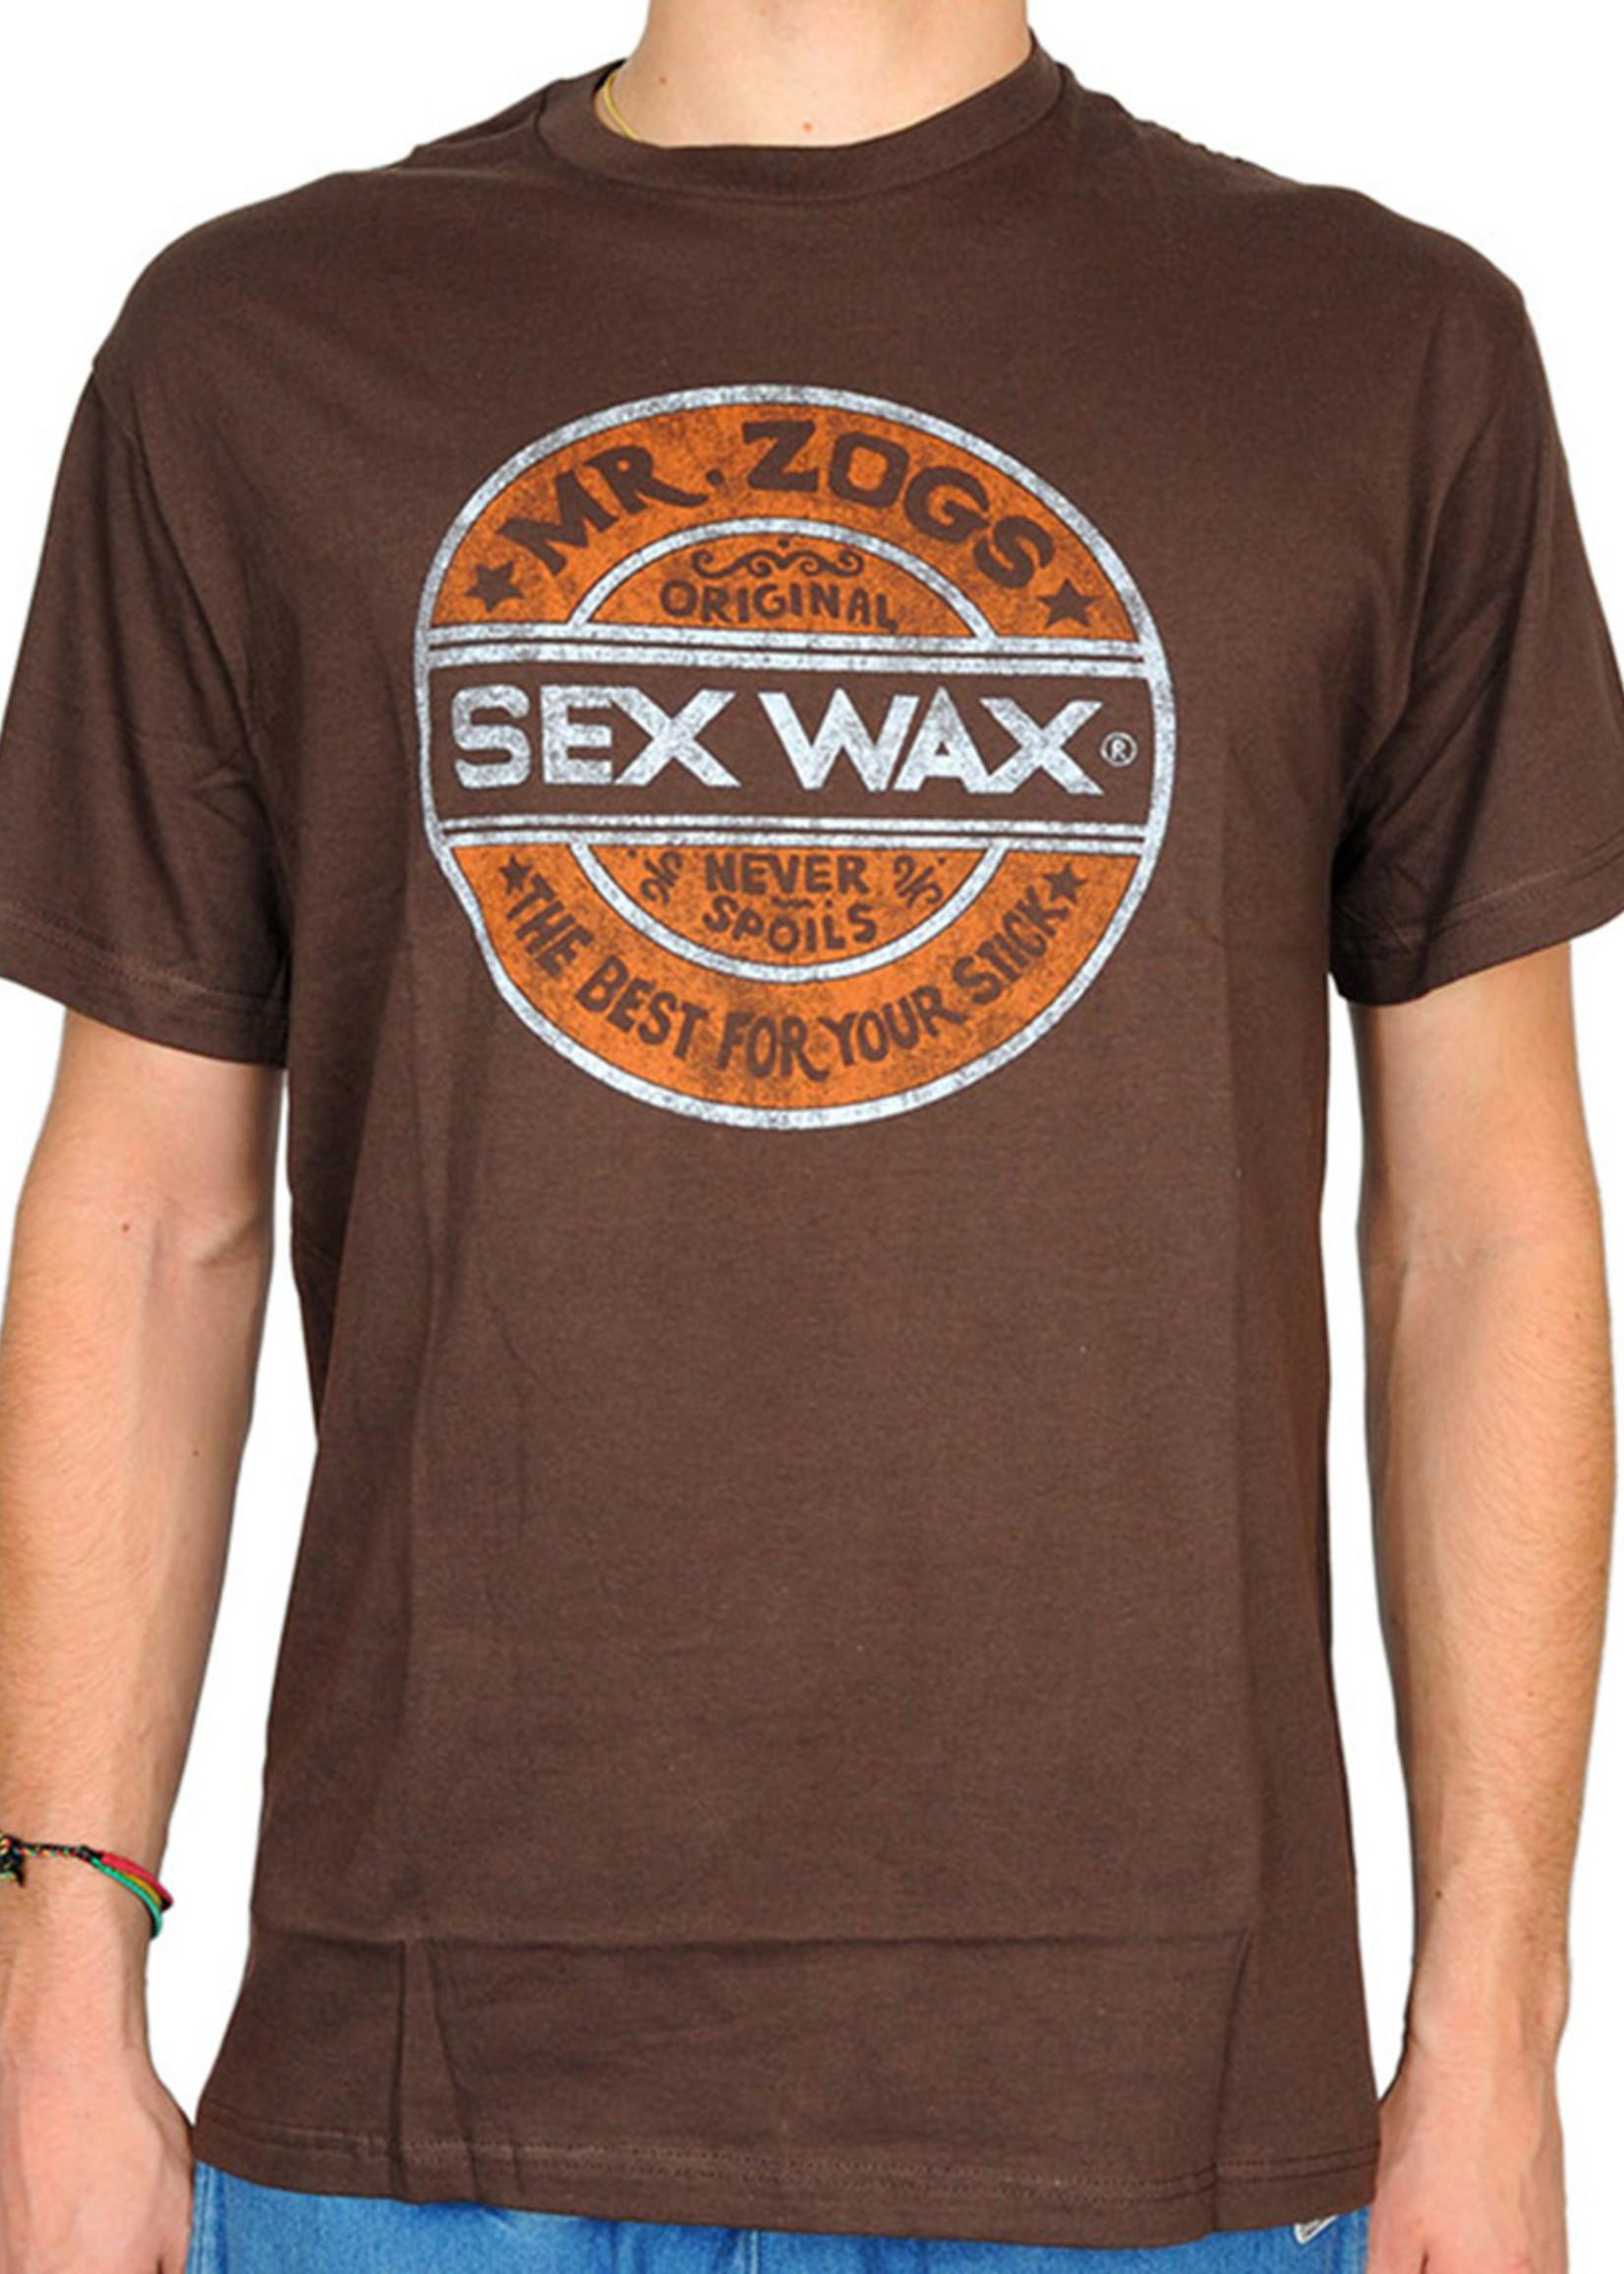 Sex Wax Sex Wax Distress Retro T-Shirt Brown